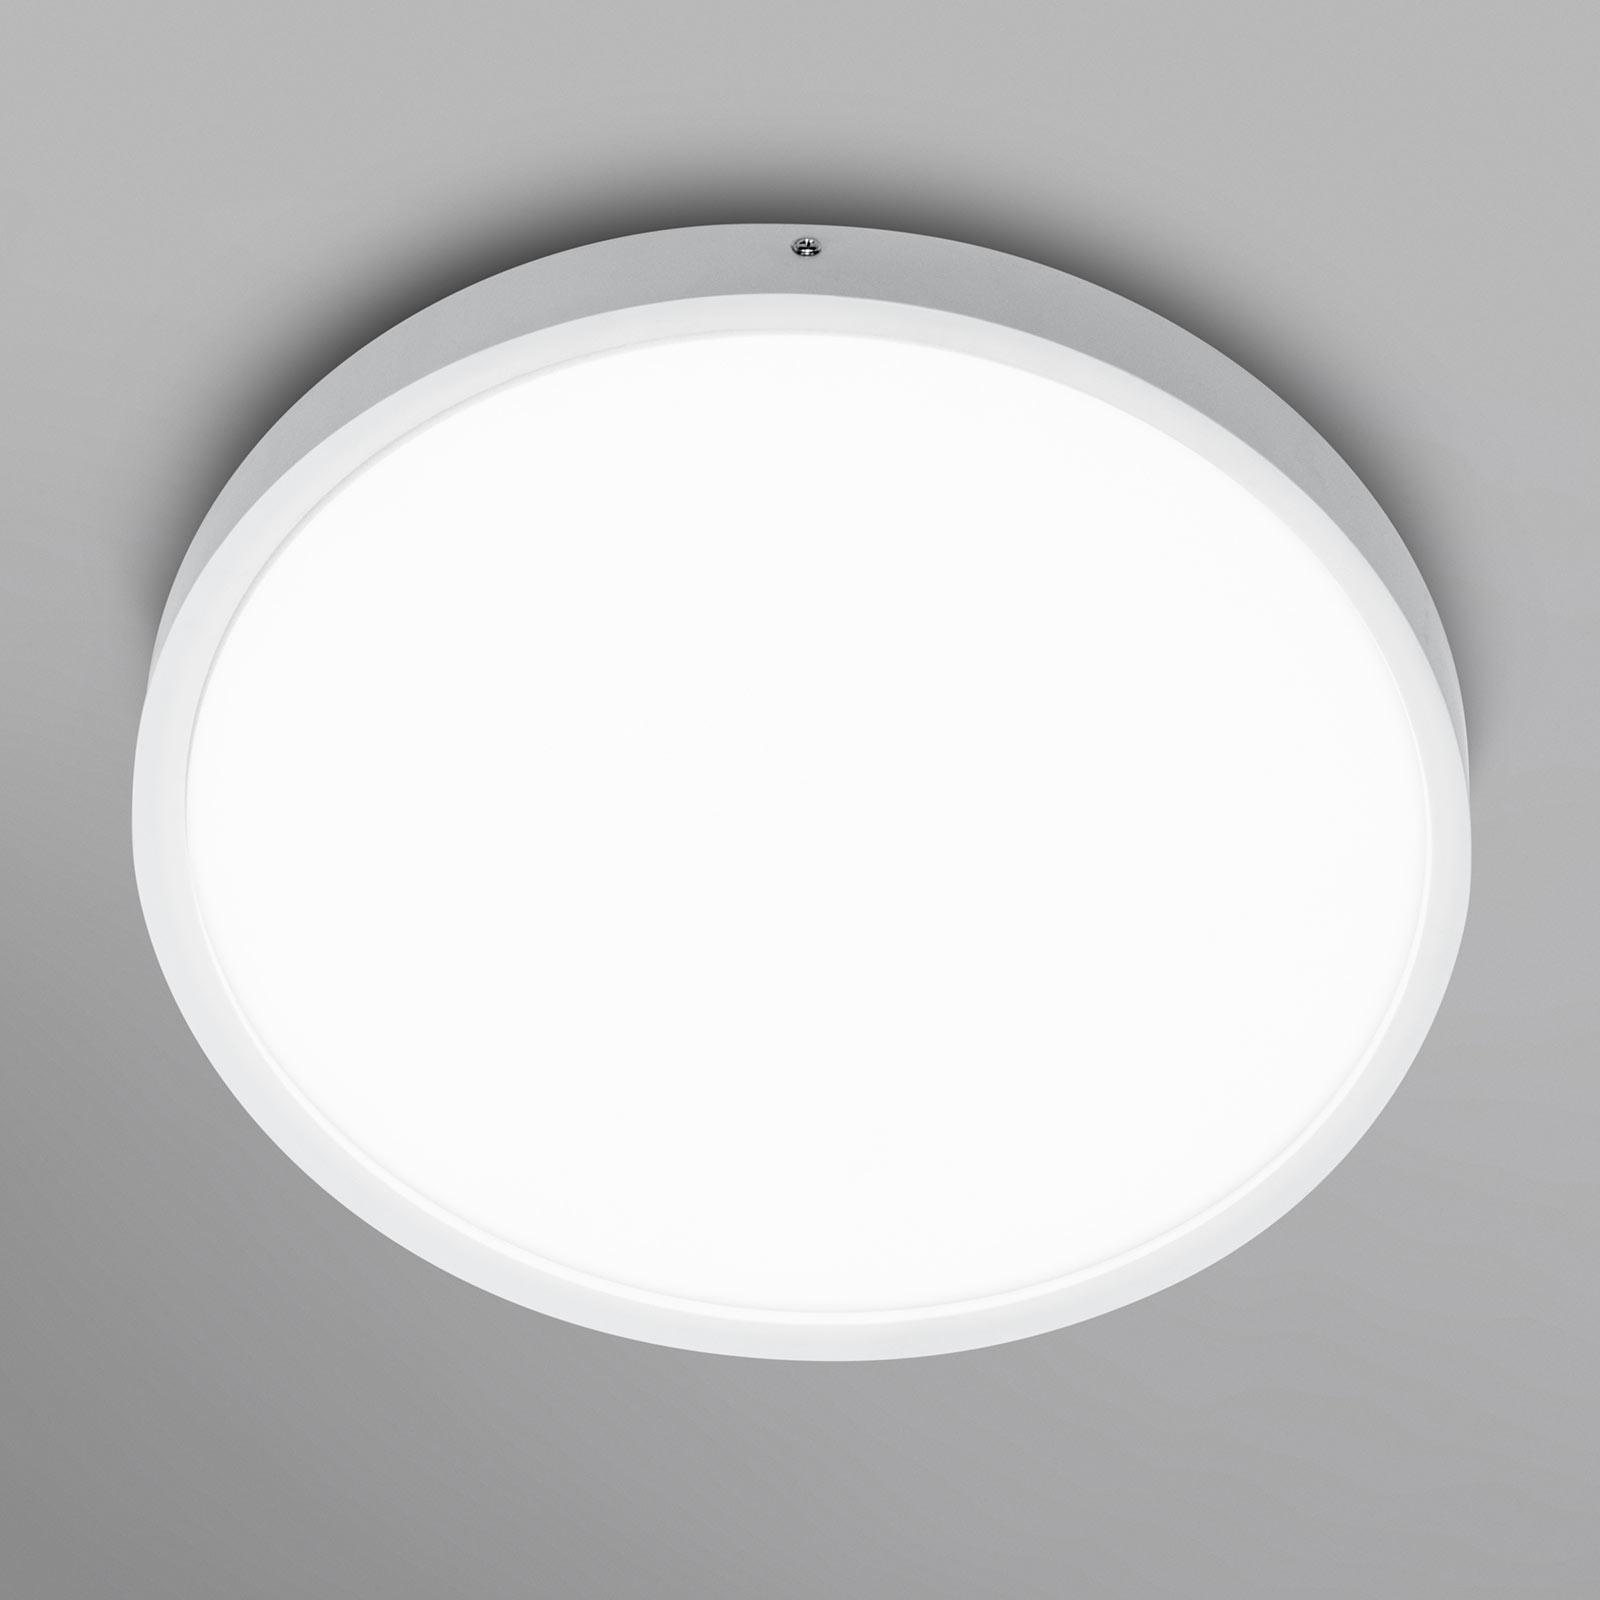 LEDVANCE Planon Round LED-taklampe 60cm 840